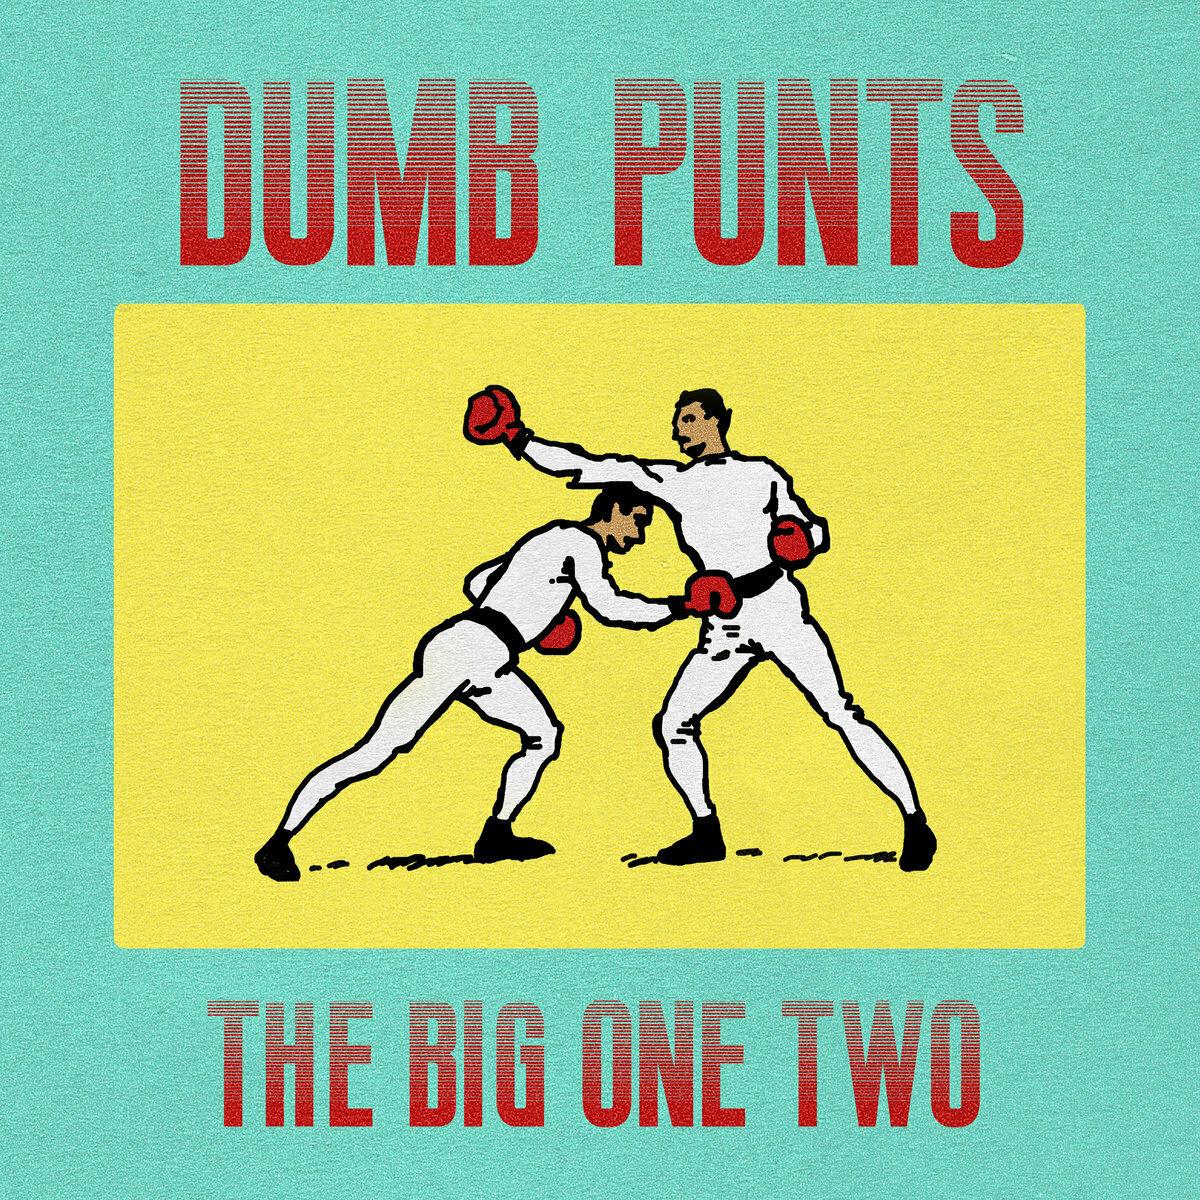 Dumb Punts - The Big One Two [LP]